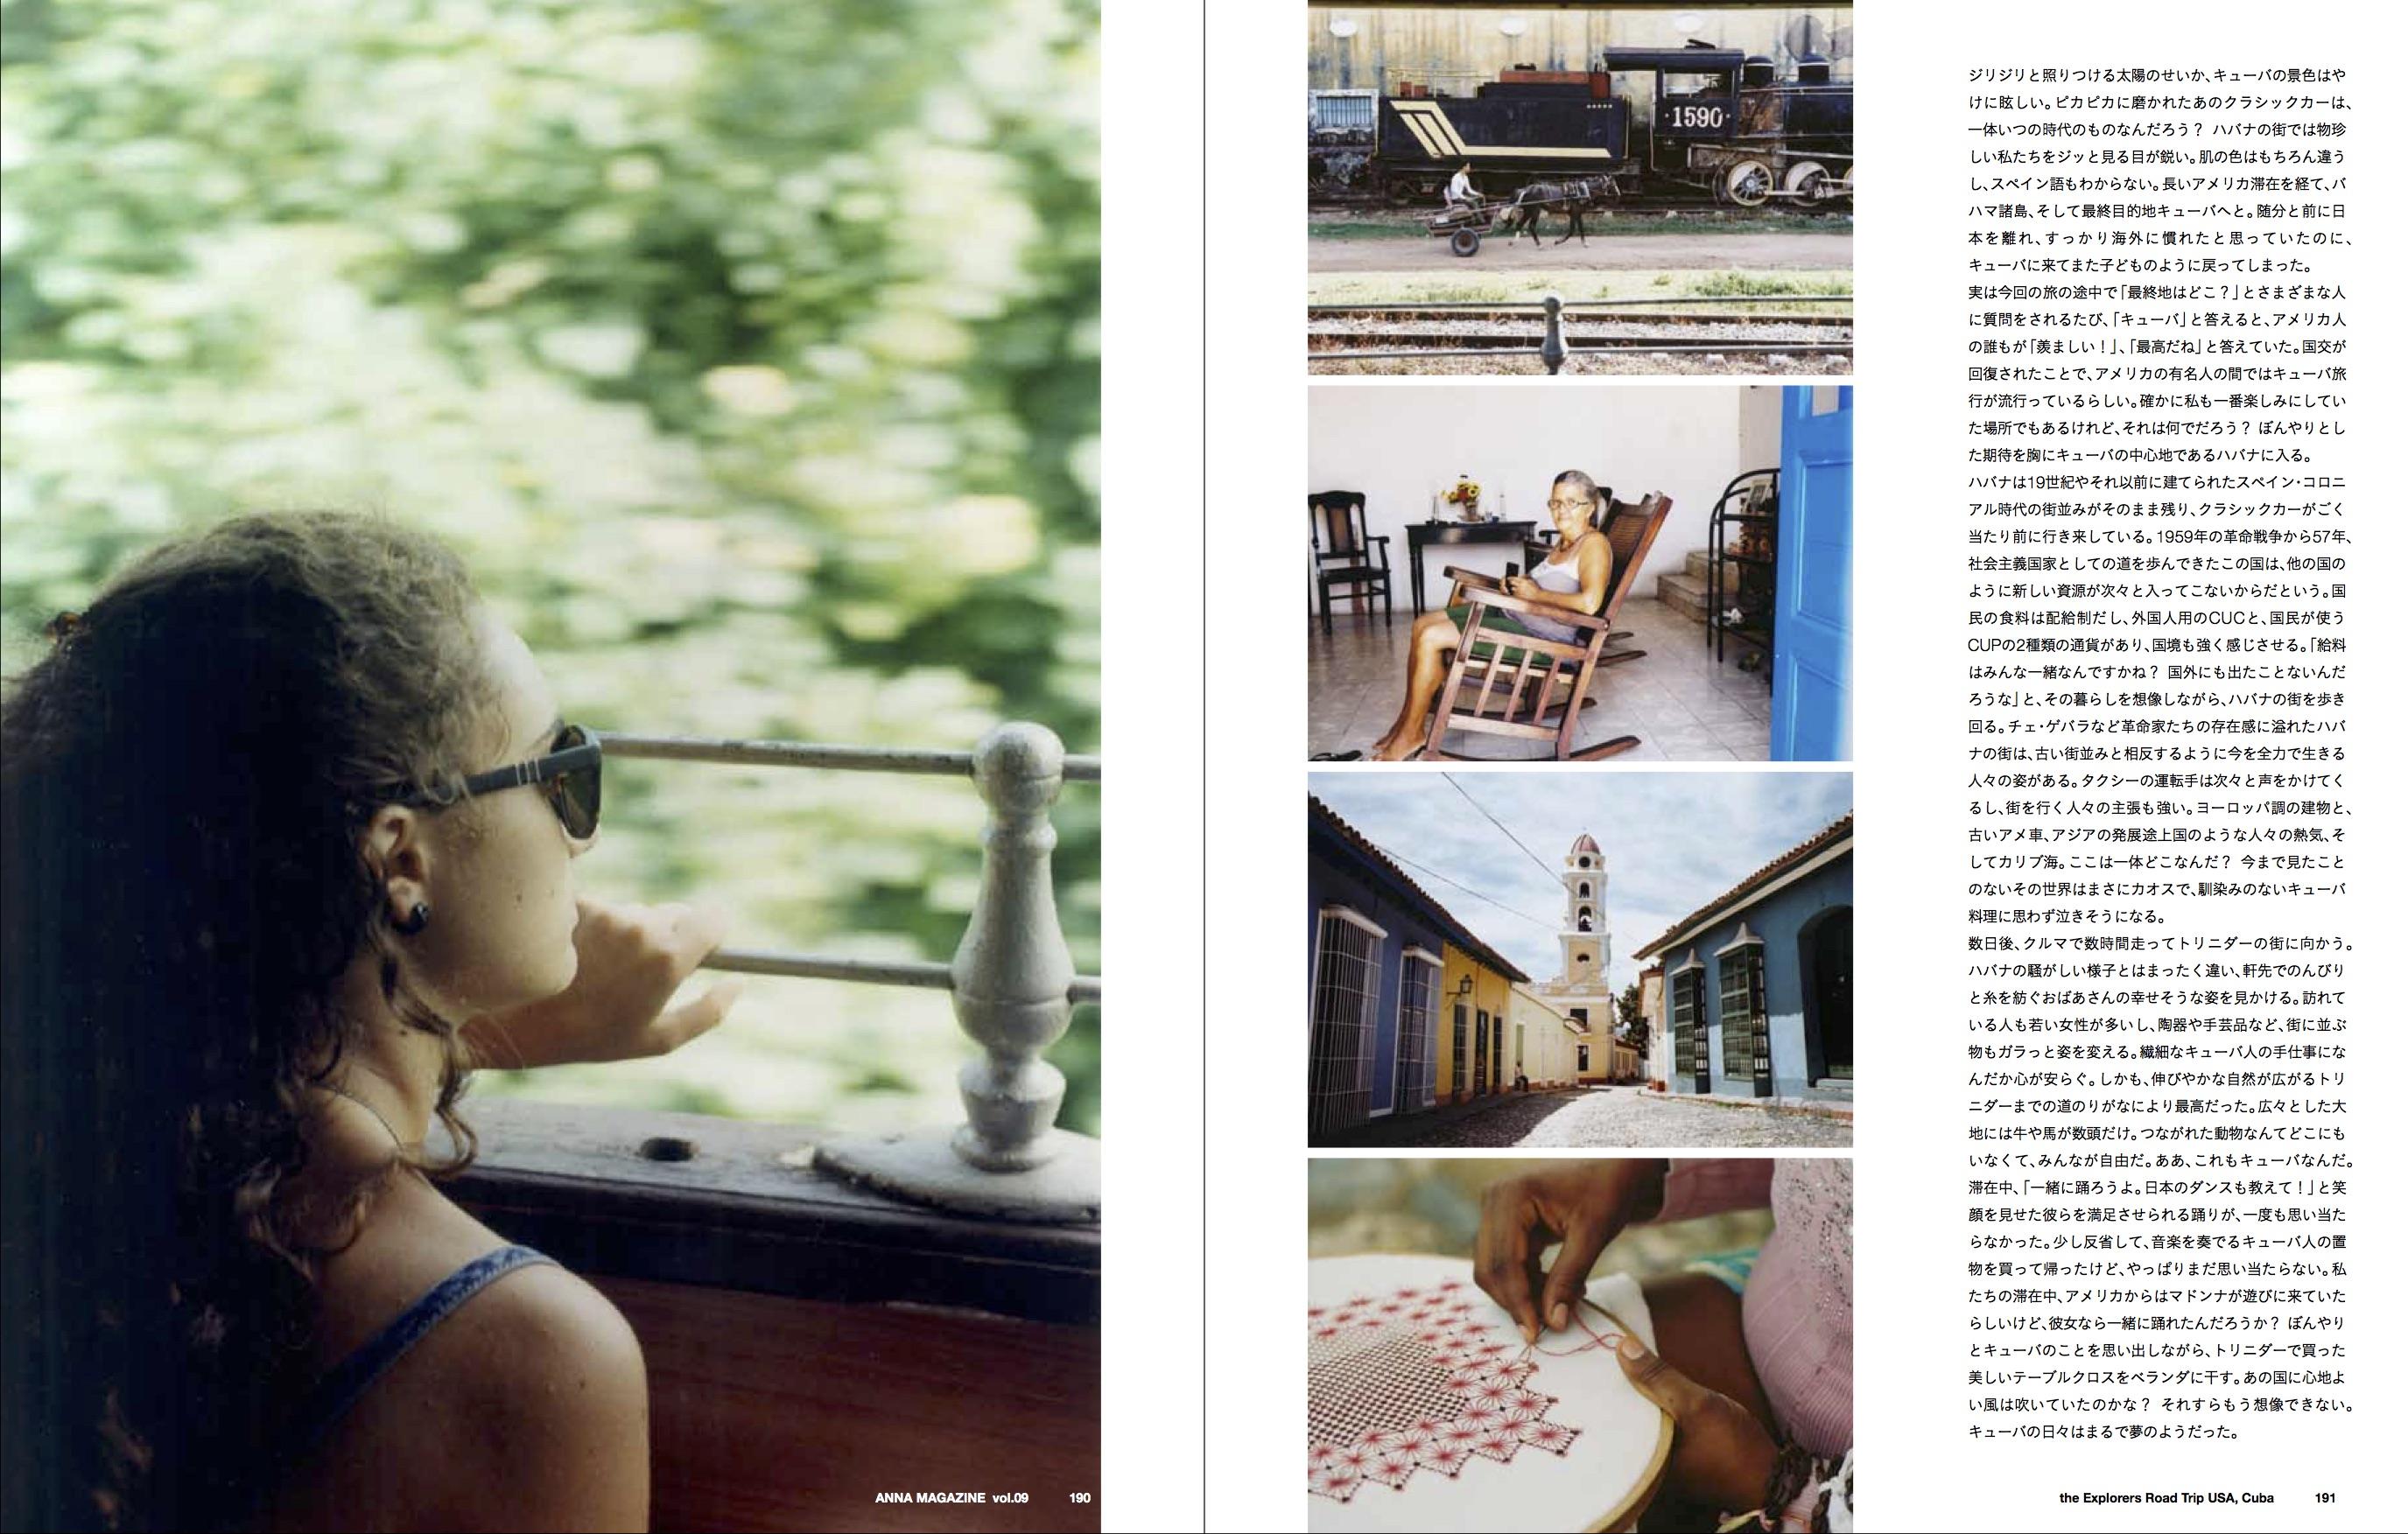 anna magazine vol.9 P95